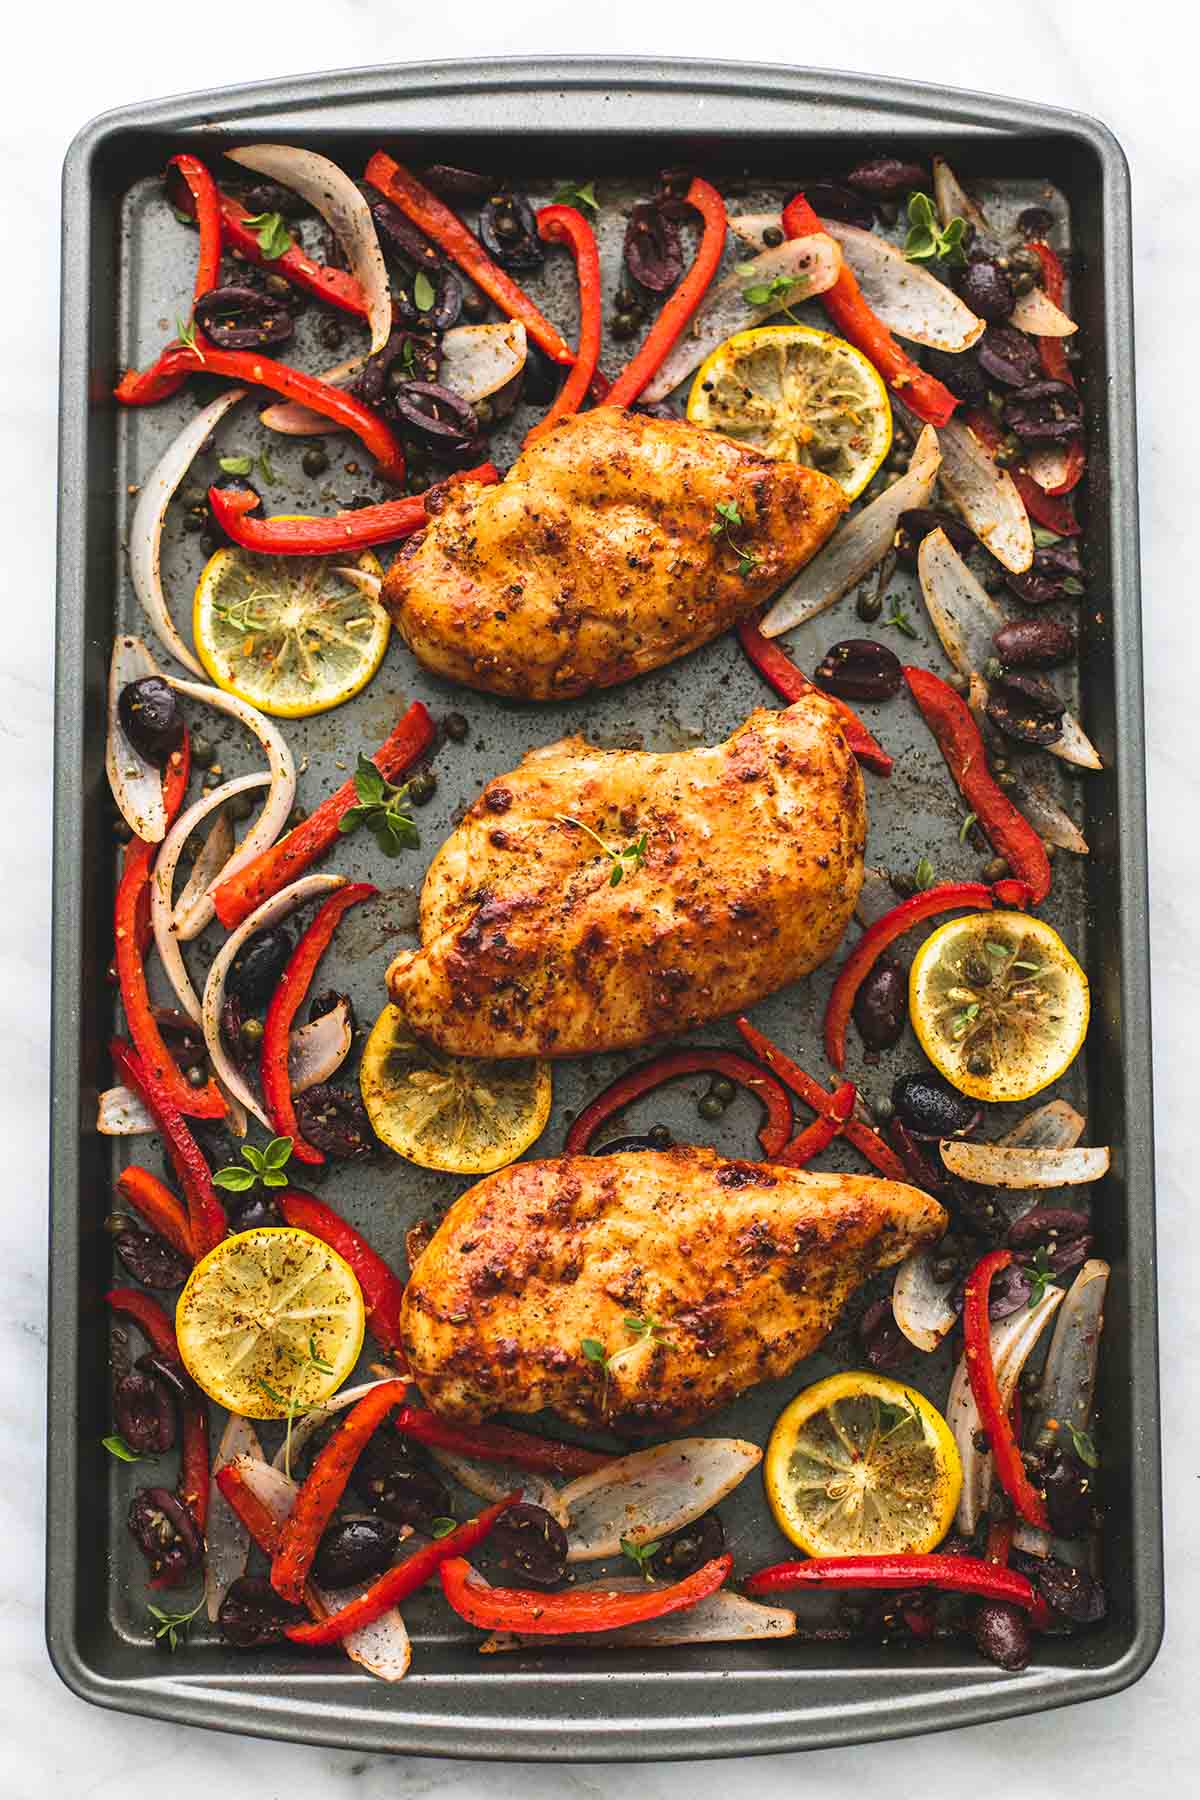 top view of baked Greek chicken sheet pan dinner on a baking sheet.